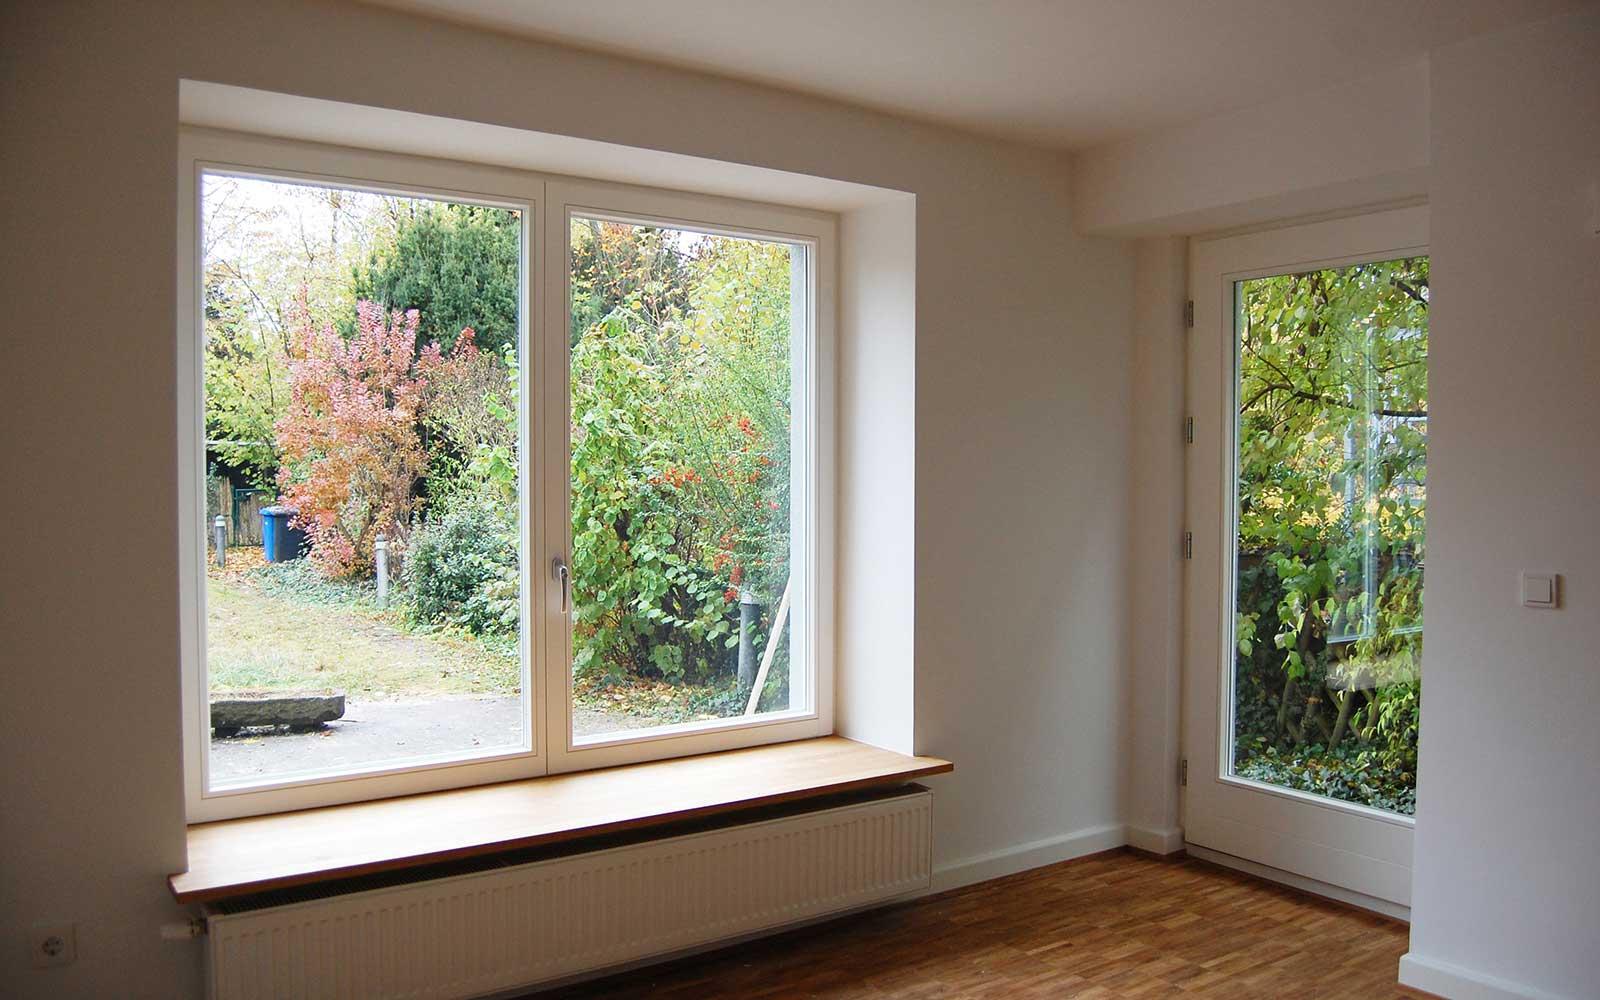 parkinsel kochhan weckbach architekten heidelberg. Black Bedroom Furniture Sets. Home Design Ideas